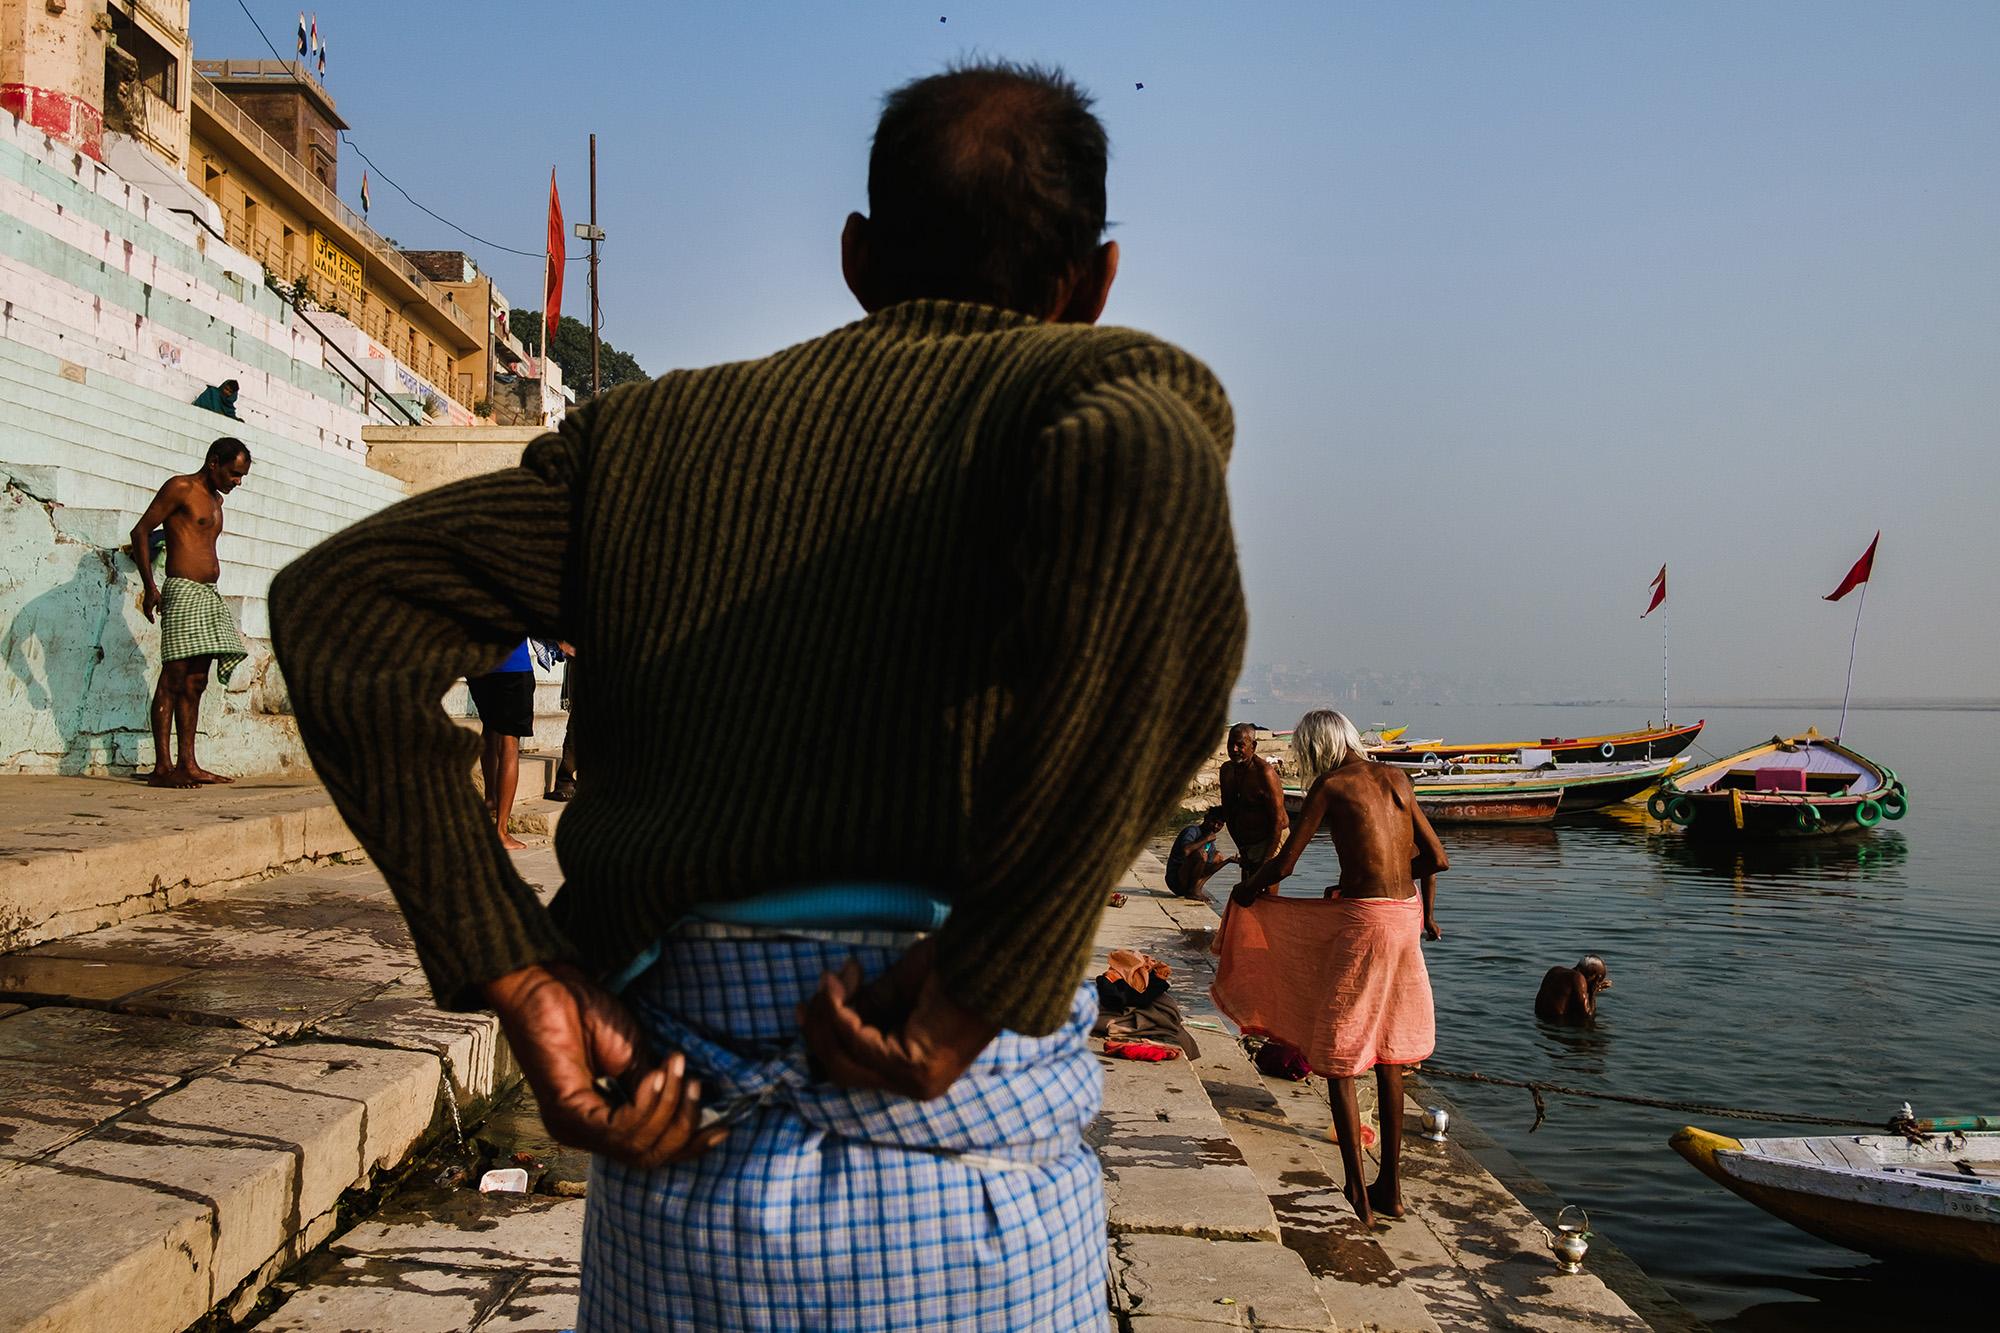 AnjaPoehlmann_India-Varanasi_119.jpg